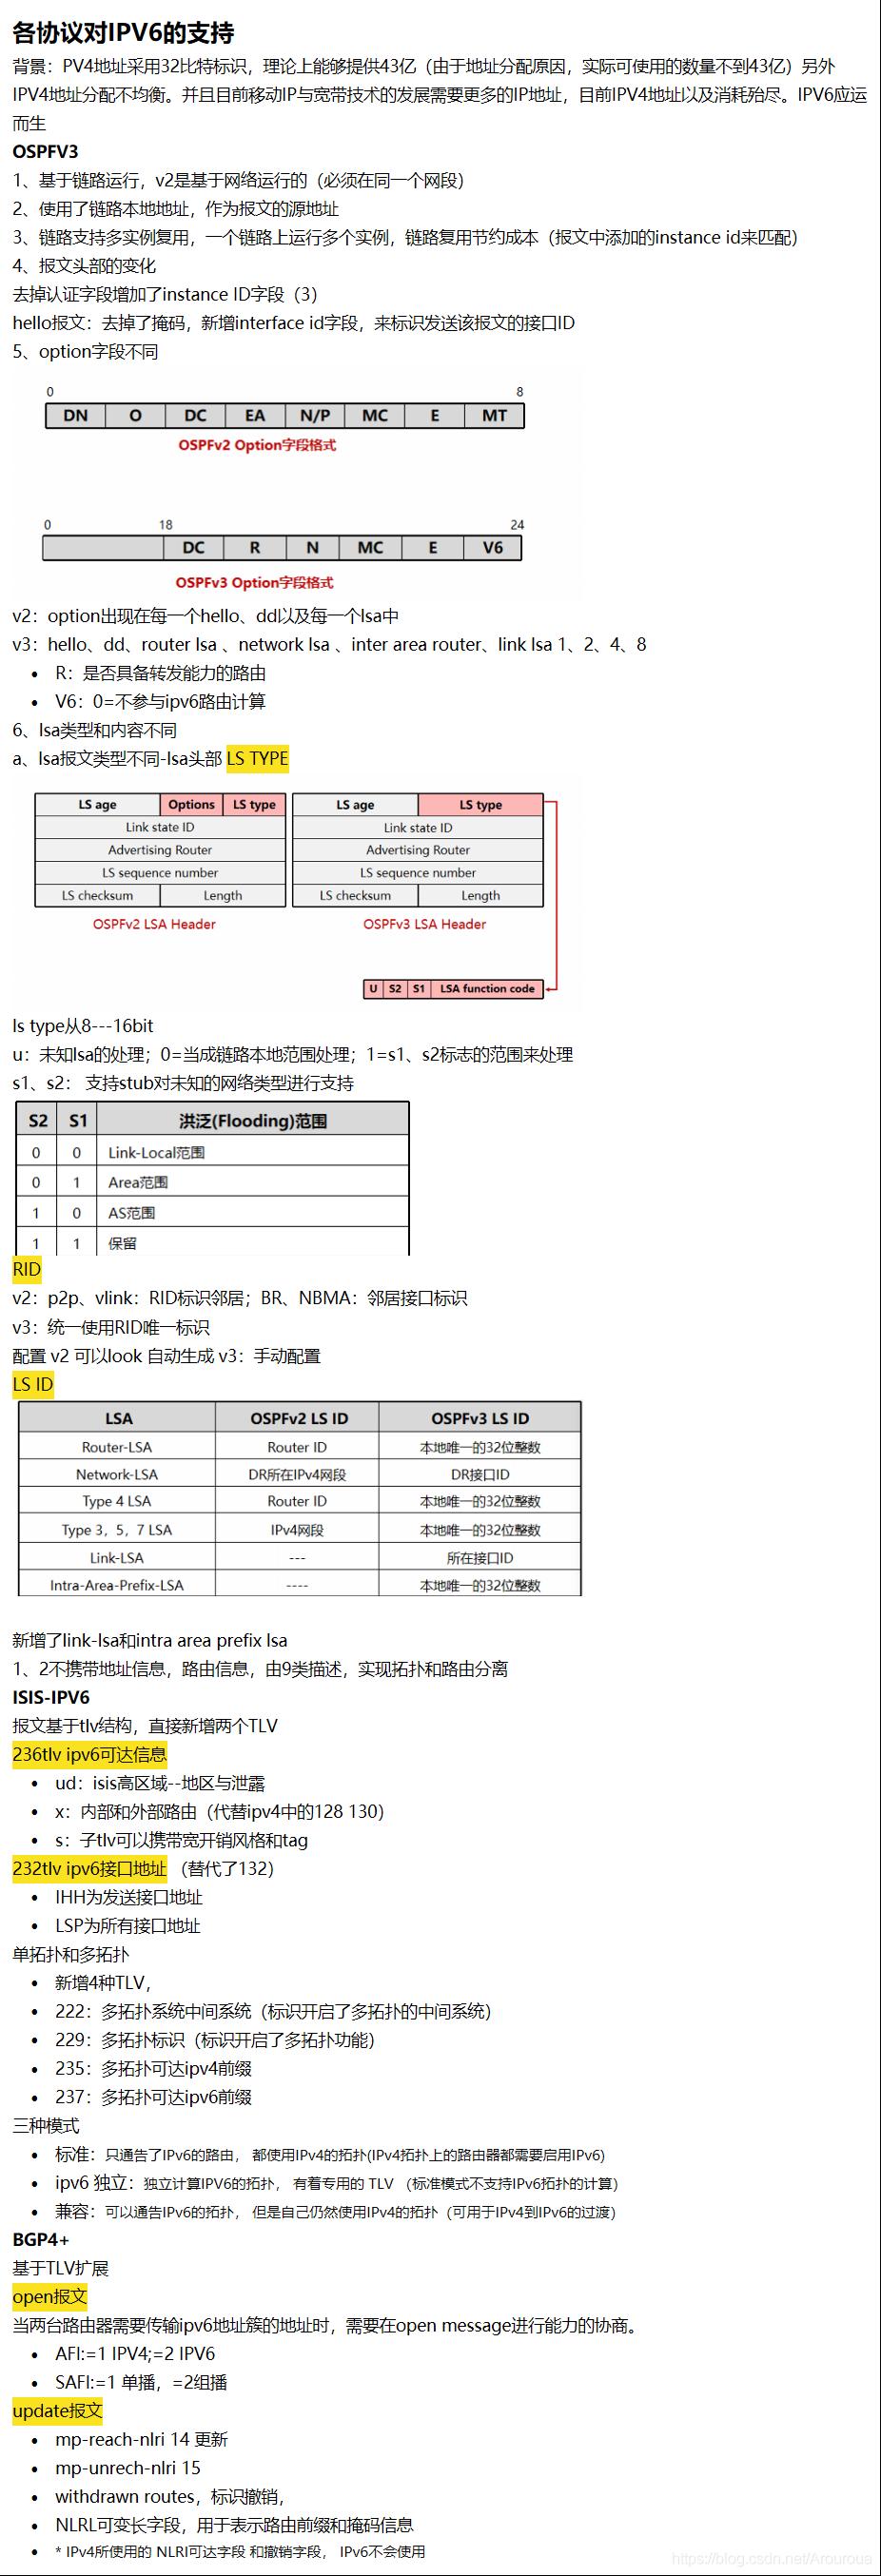 ](https://img-blog.csdnimg.cn/20210418205930466.png?x-oss-process=image/watermark,type_ZmFuZ3poZW5naGVpdGk,shadow_10,text_aHR0cHM6Ly9ibG9nLmNzZG4ubmV0L0Fyb3Vyb3Vh,size_16,color_FFFFFF,t_70)